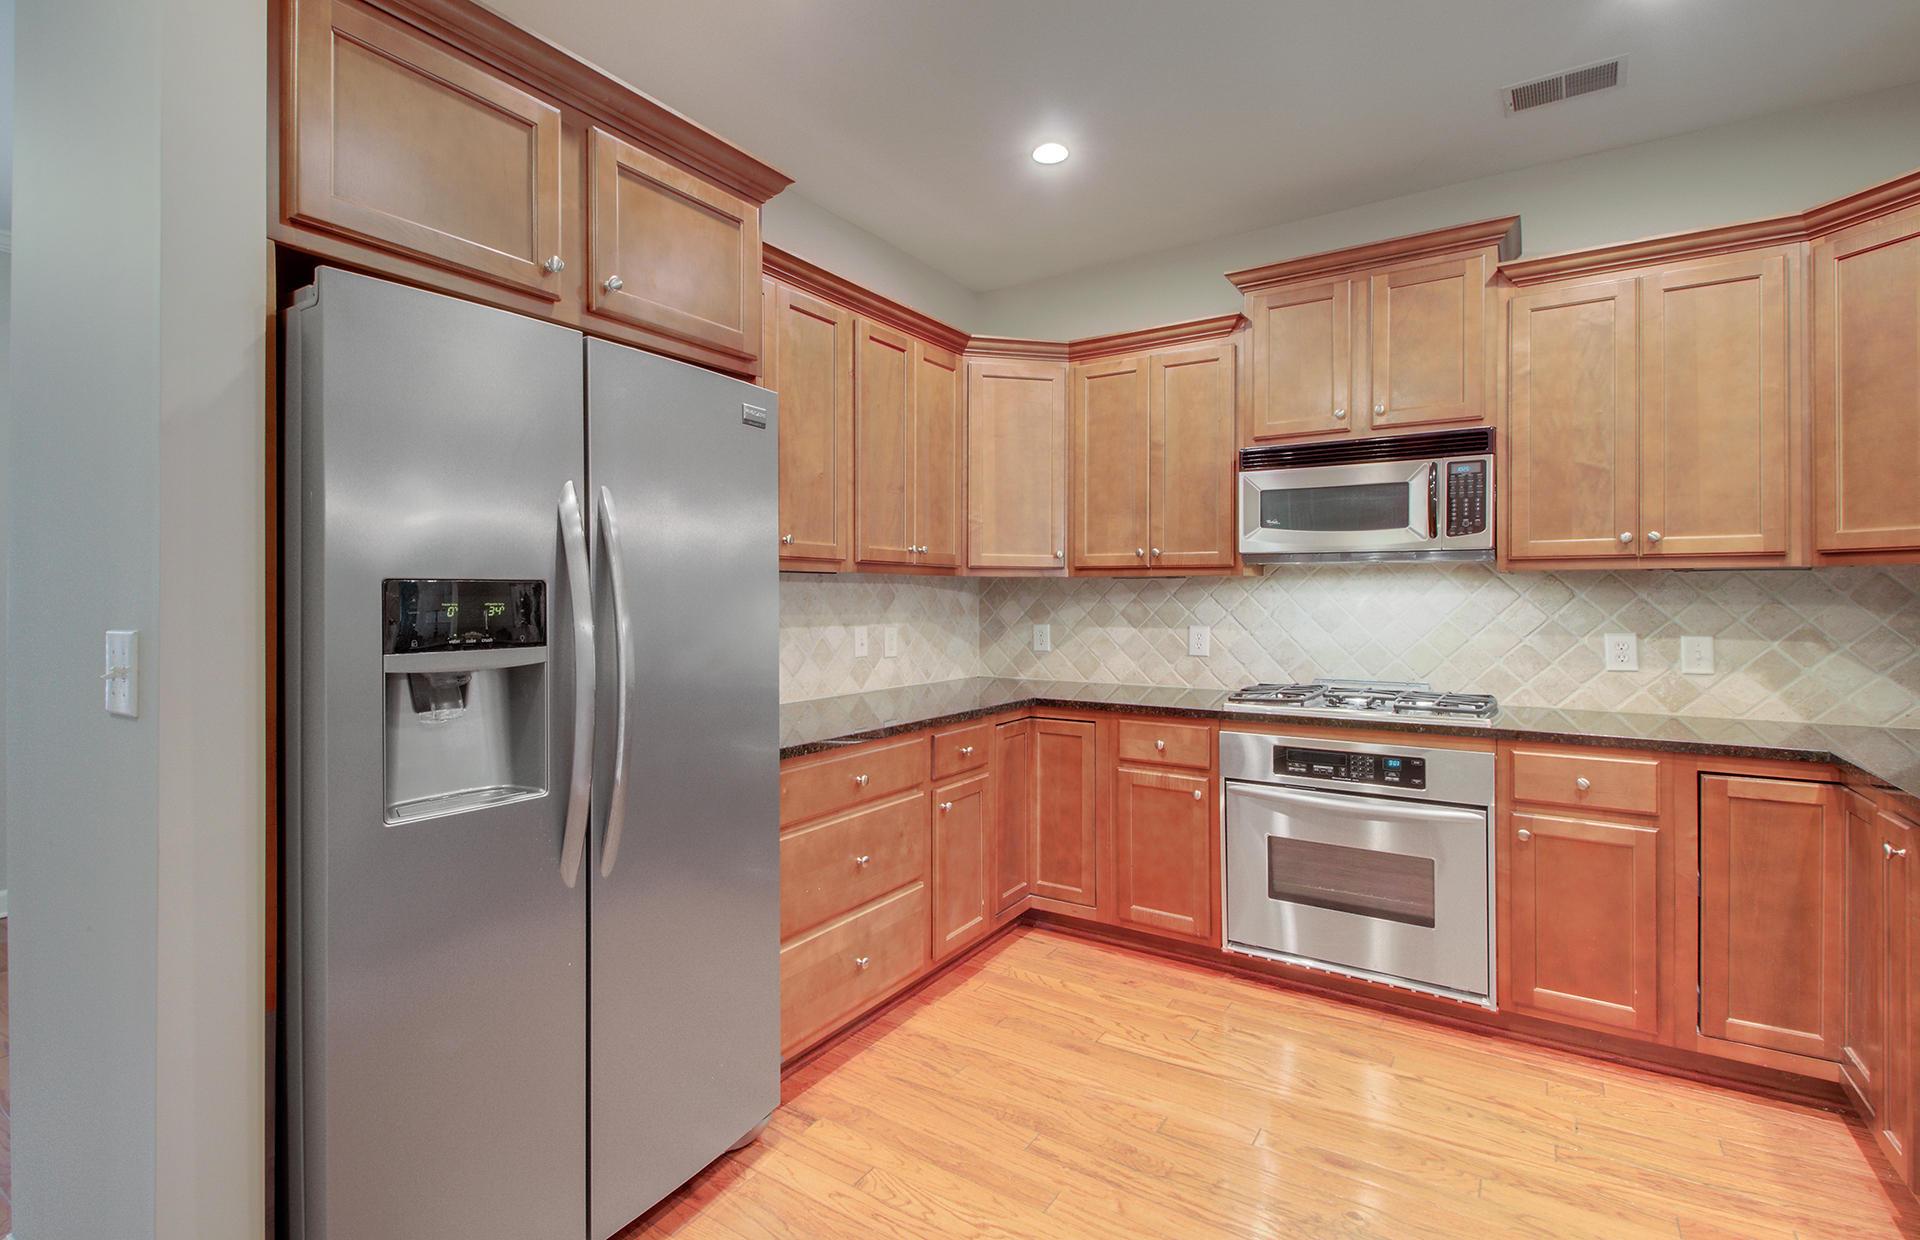 Dunes West Homes For Sale - 145 Fresh Meadow, Mount Pleasant, SC - 11